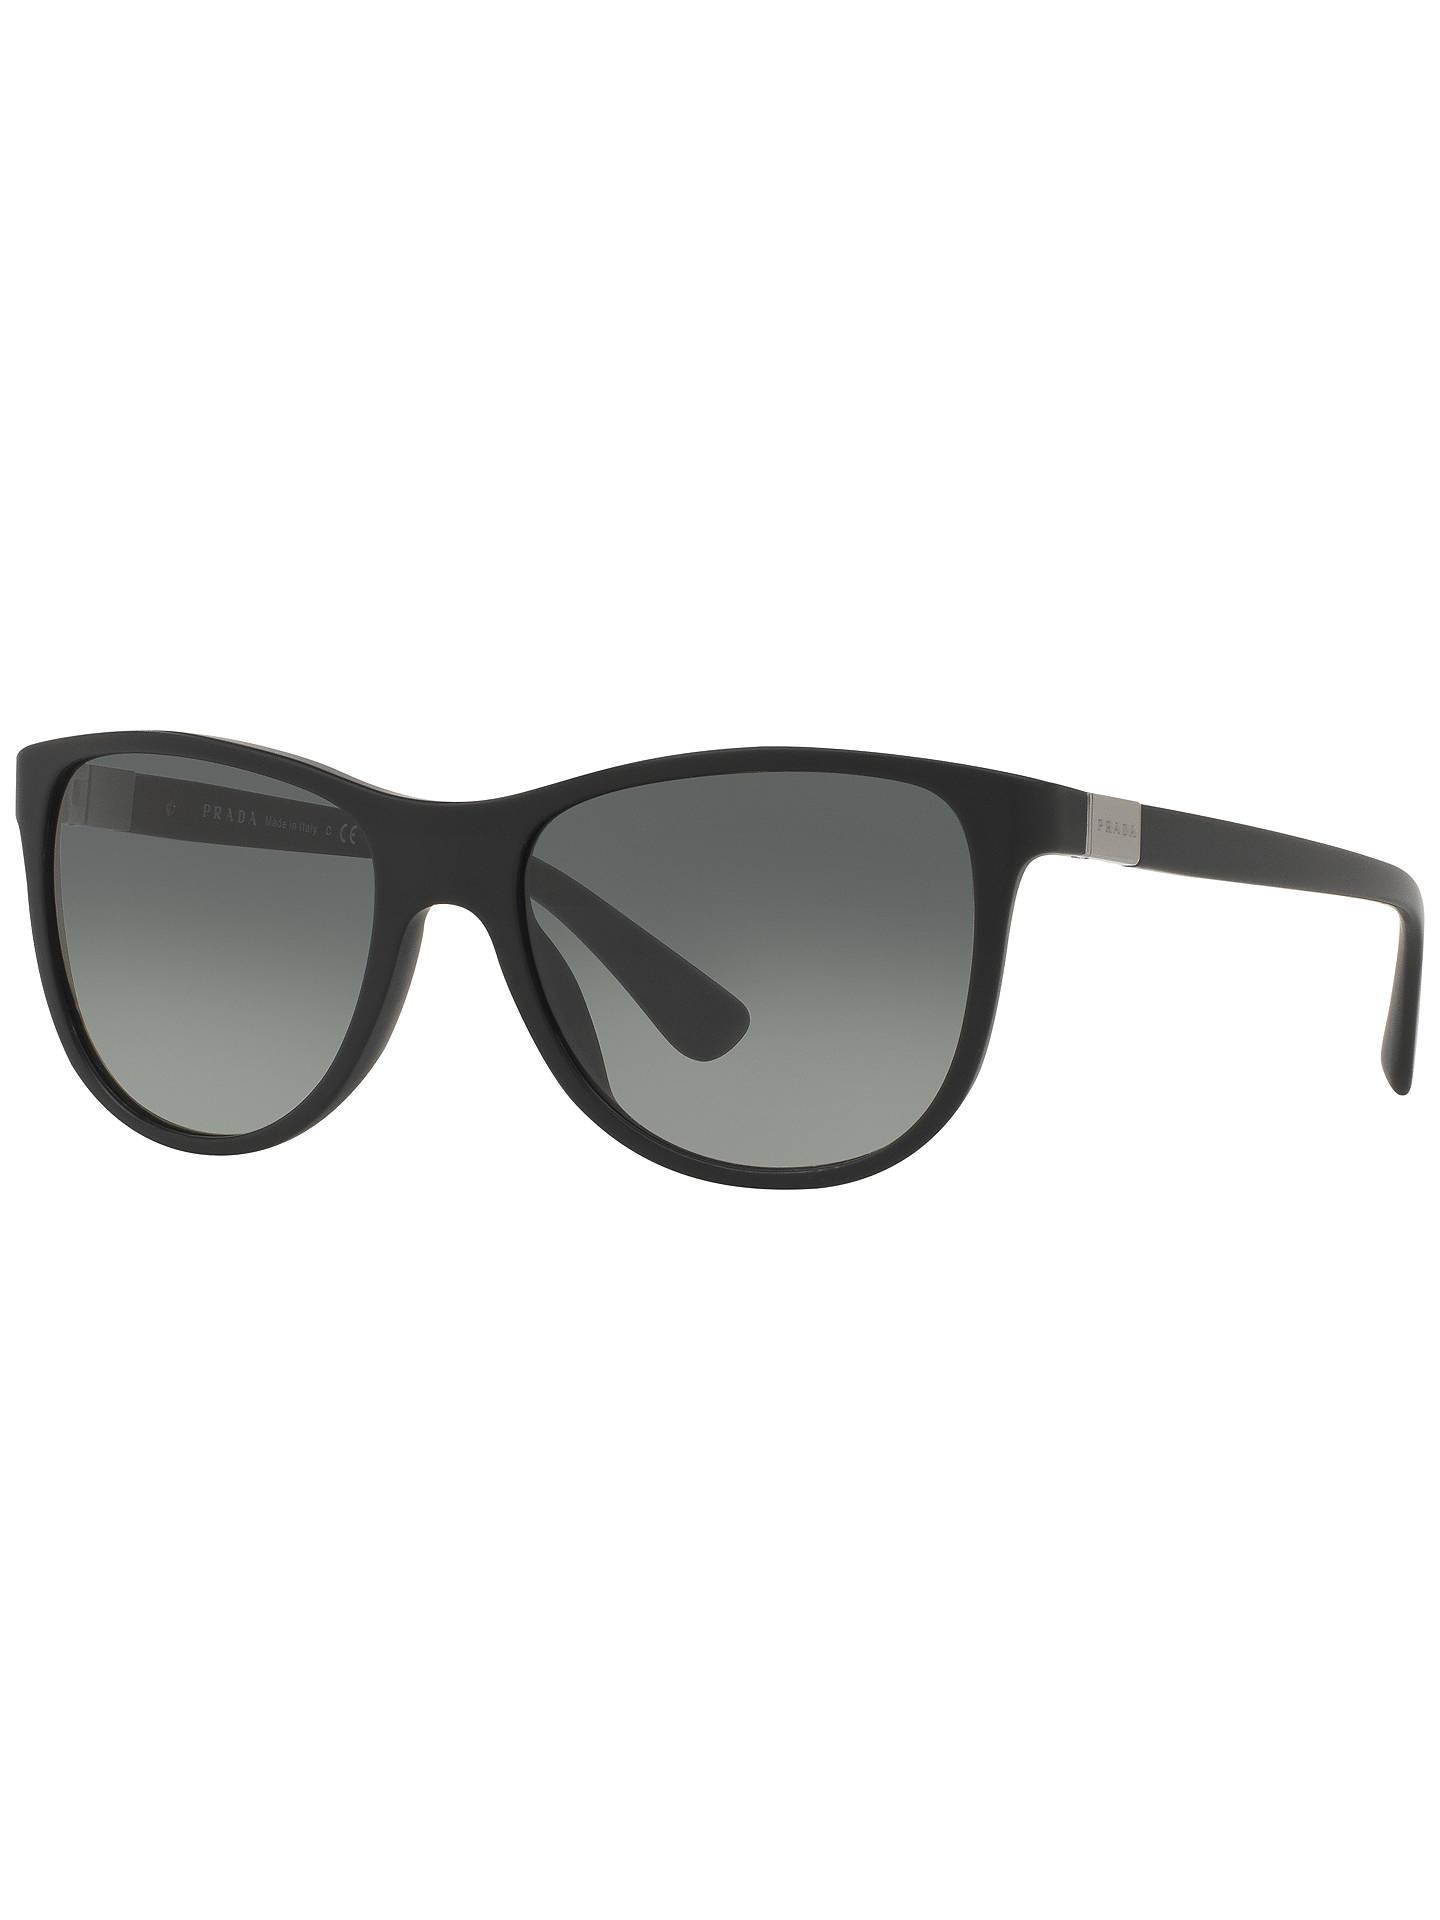 Prada SPR20S D-Frame Sunglasses at John Lewis & Partners